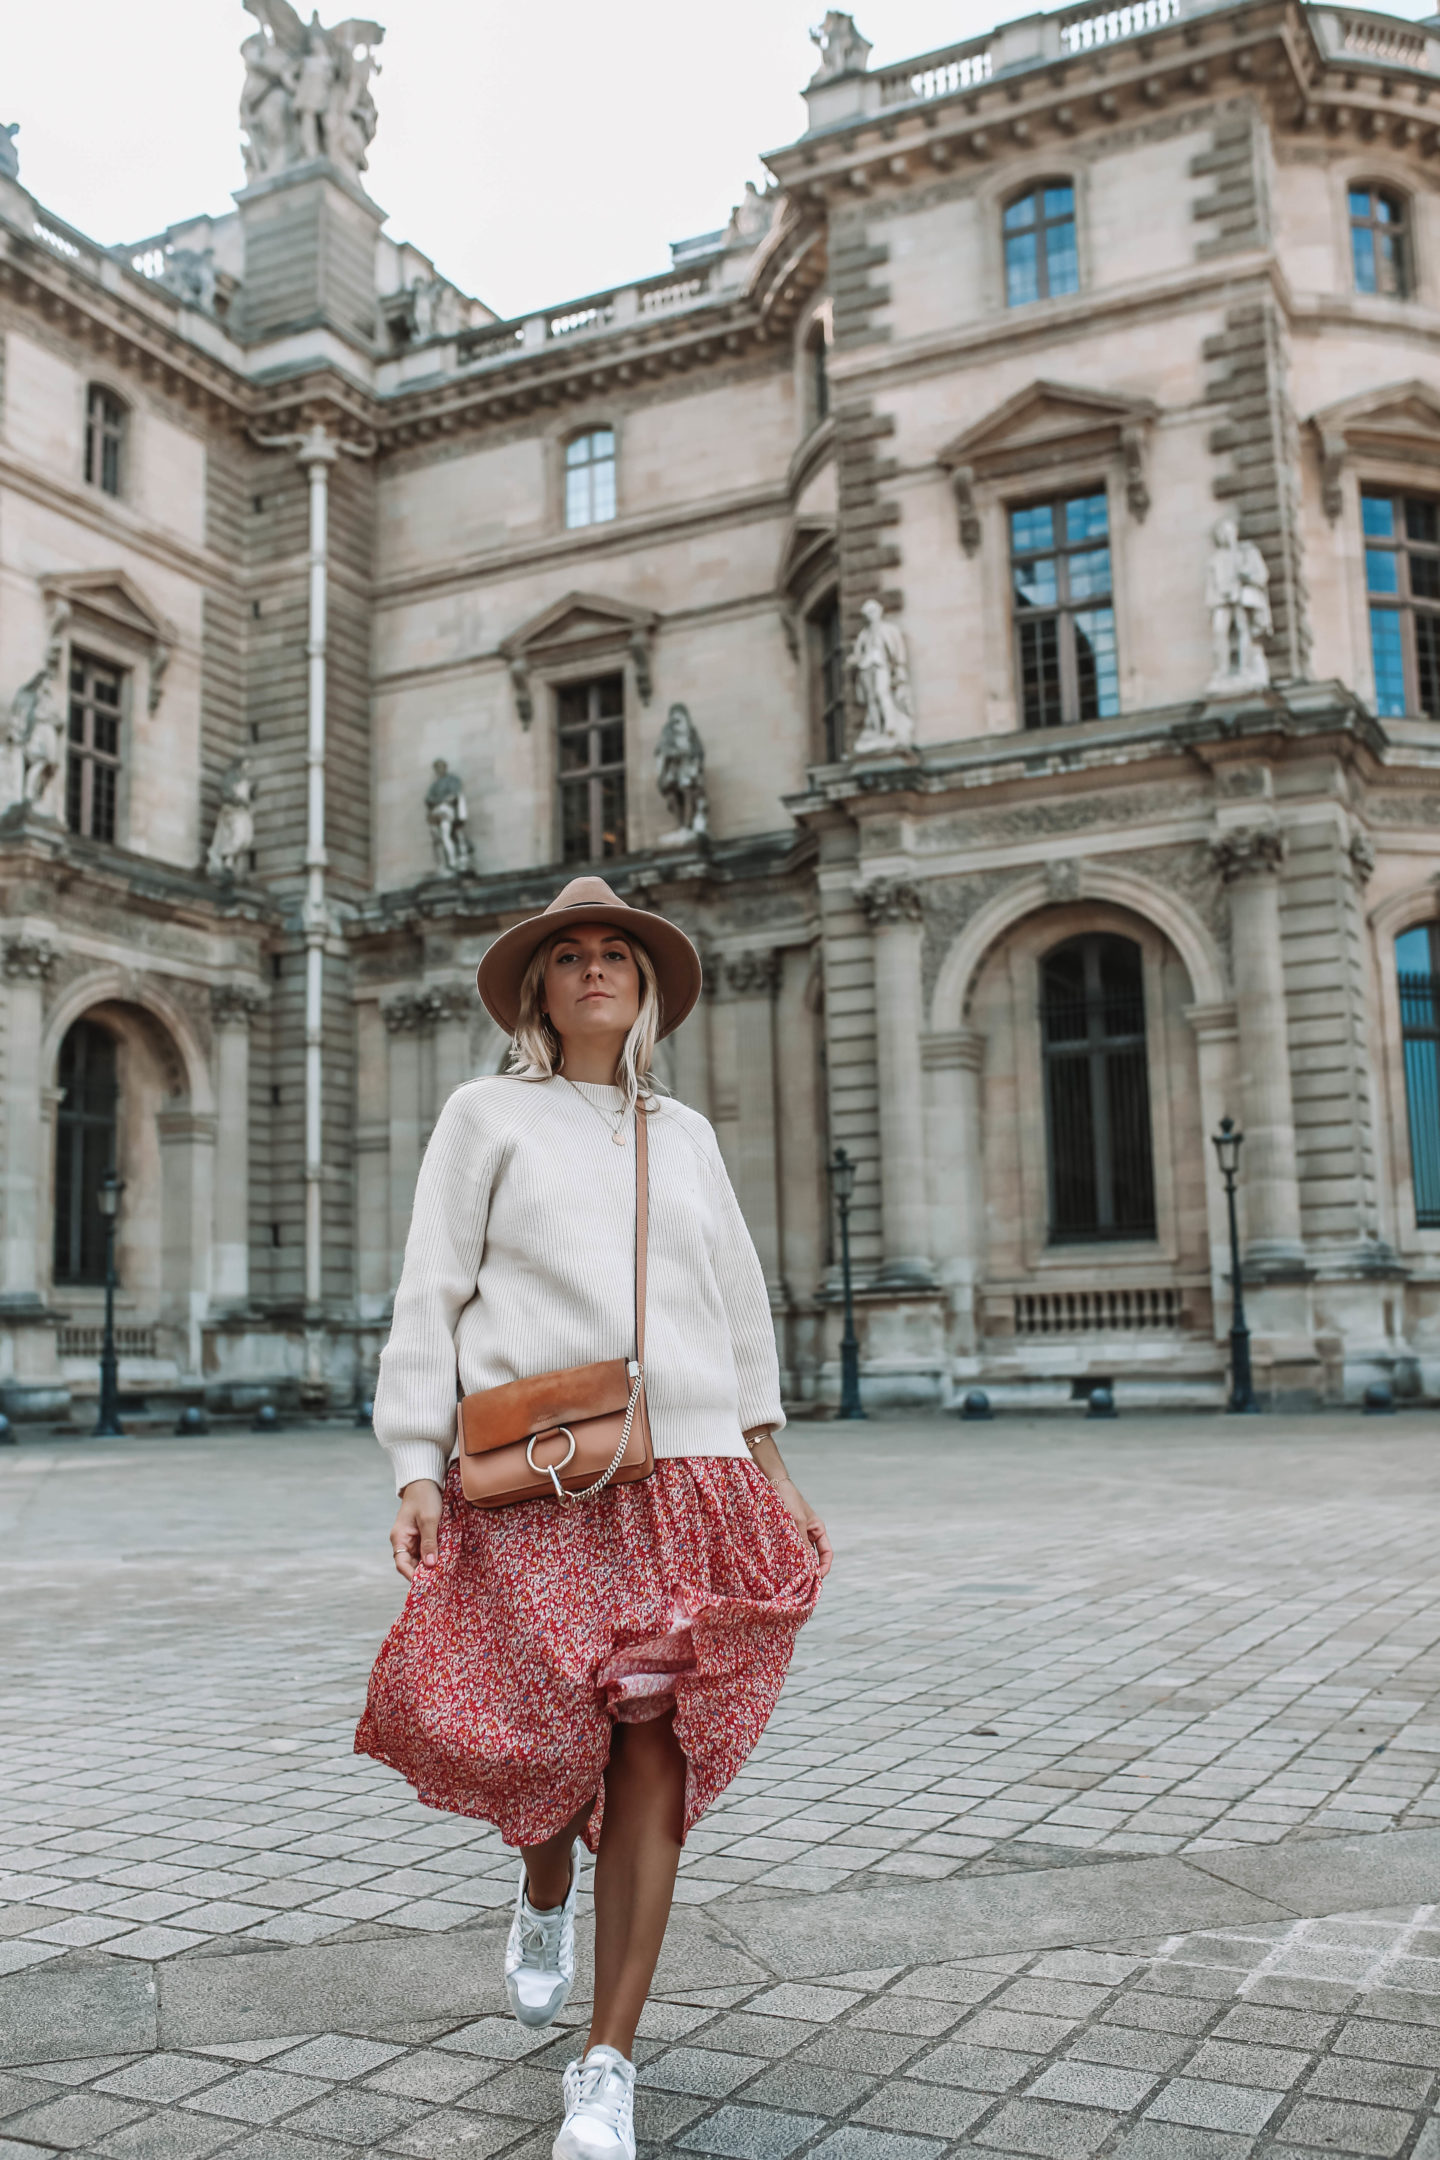 tenue oversize - Blondie Baby blog mode Paris et voyages